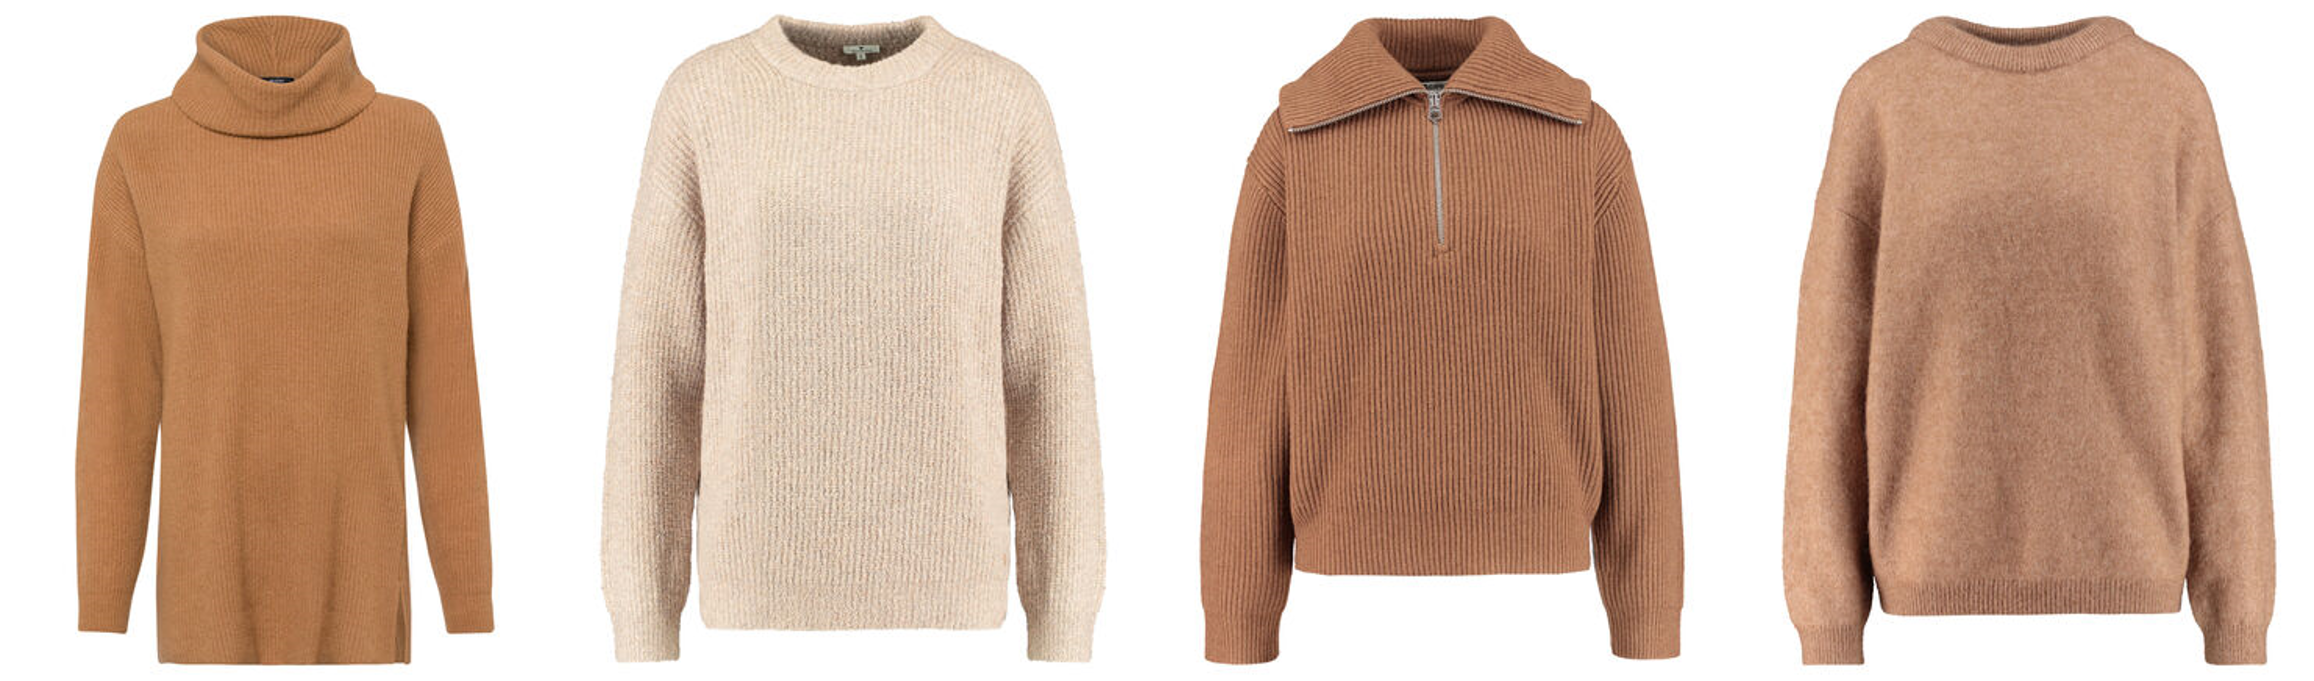 Braun - Pullover